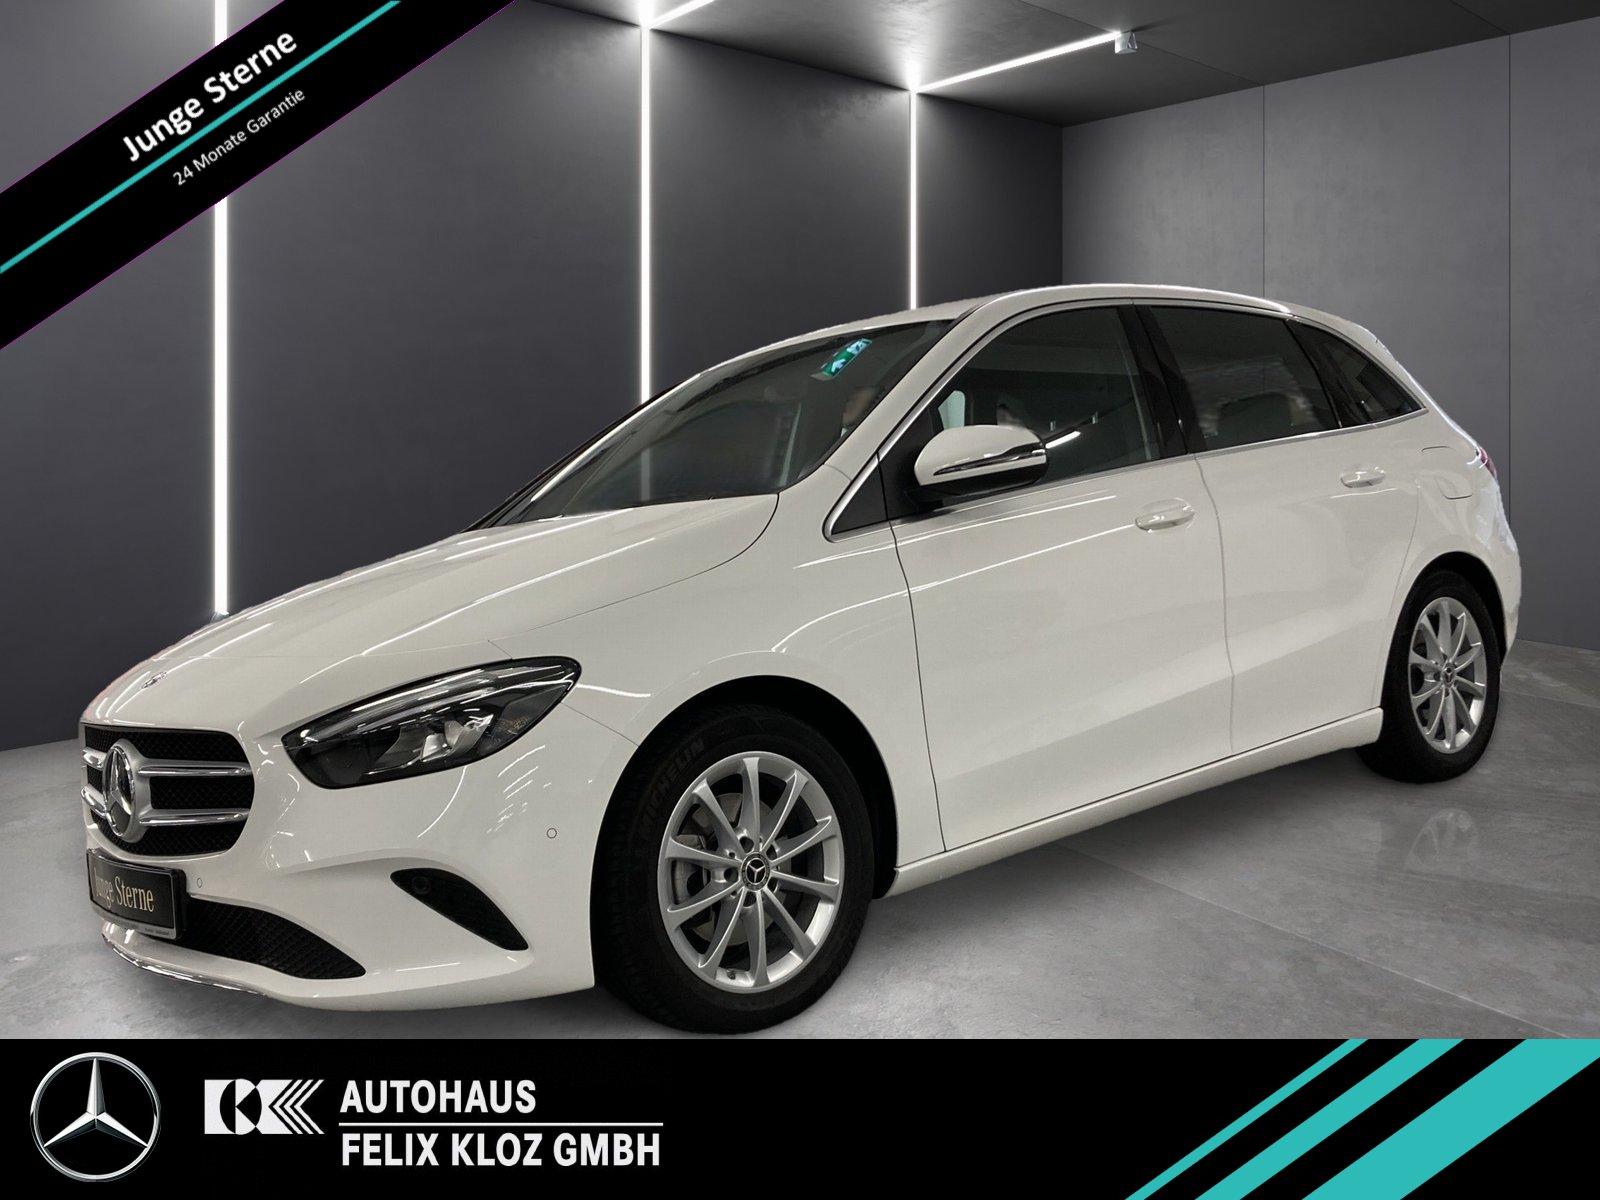 Mercedes-Benz B 200 Progressive*Navi*LED*AHK*Spurhalte*Sitzhei, Jahr 2019, Benzin